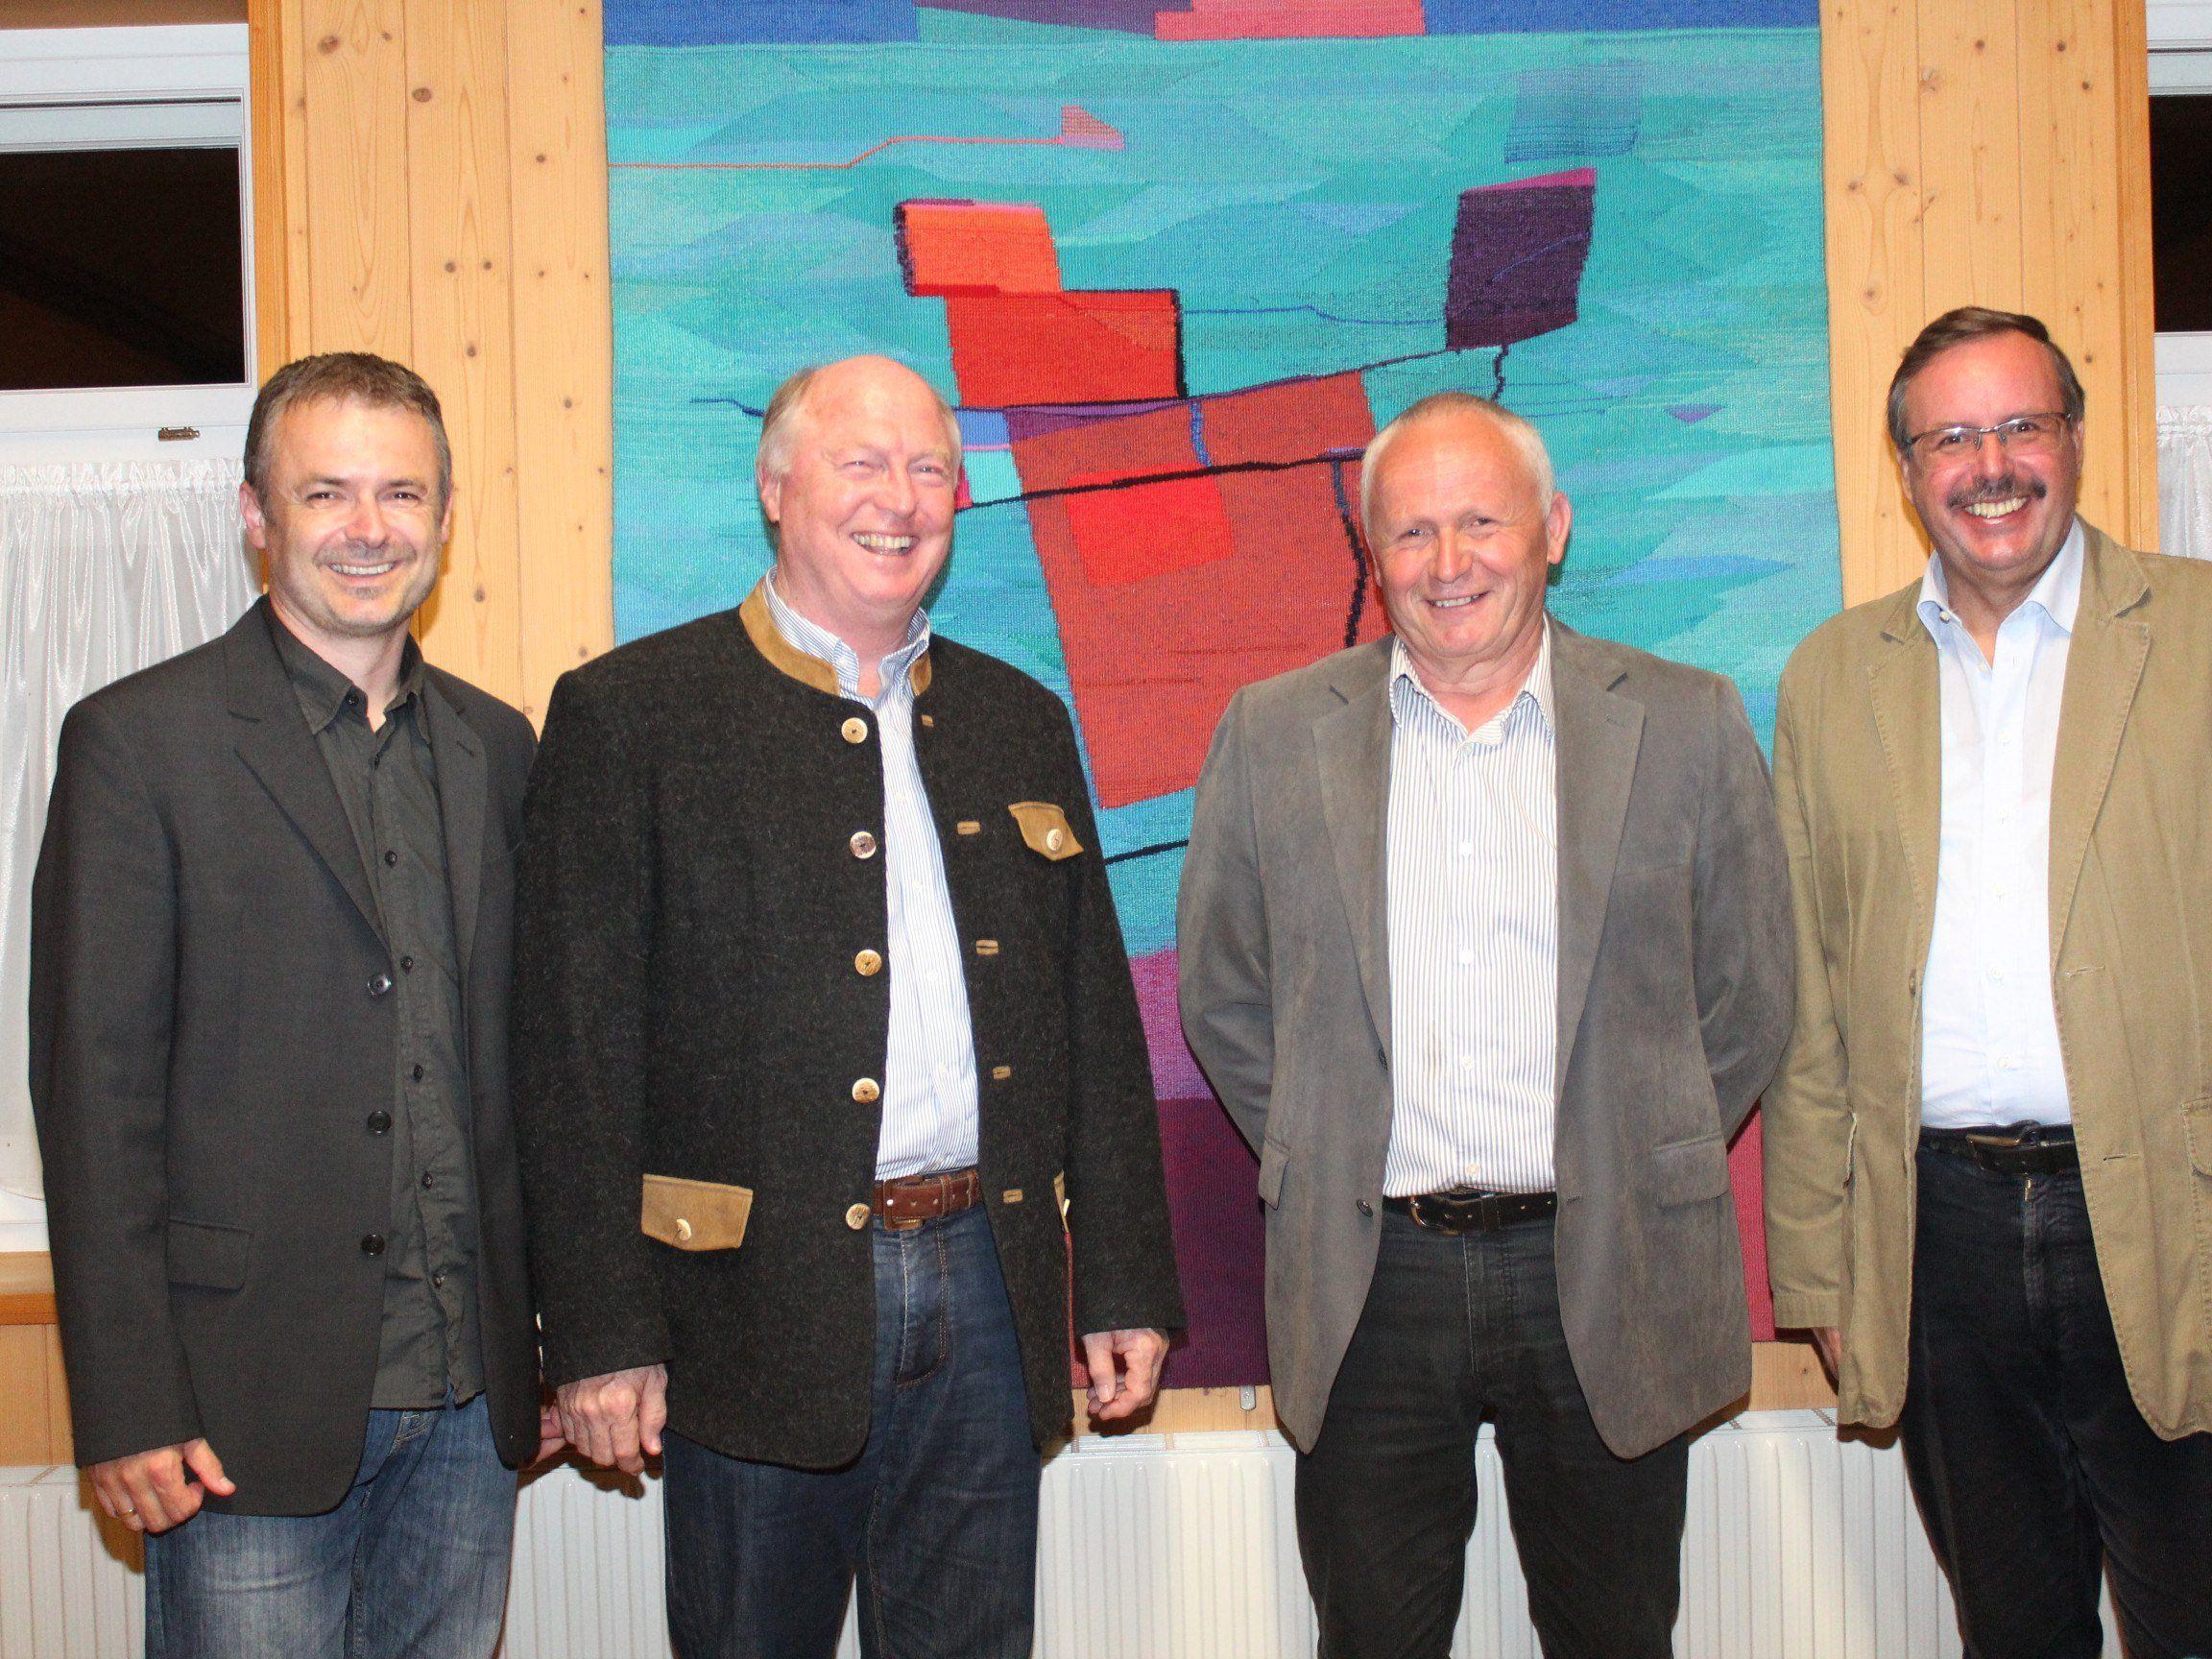 Vizebgm. Walter Moosbrugger, Alt-Bgm. Egon Troy, Bgm. Roman Immler und GR Dietmar Schratzer.